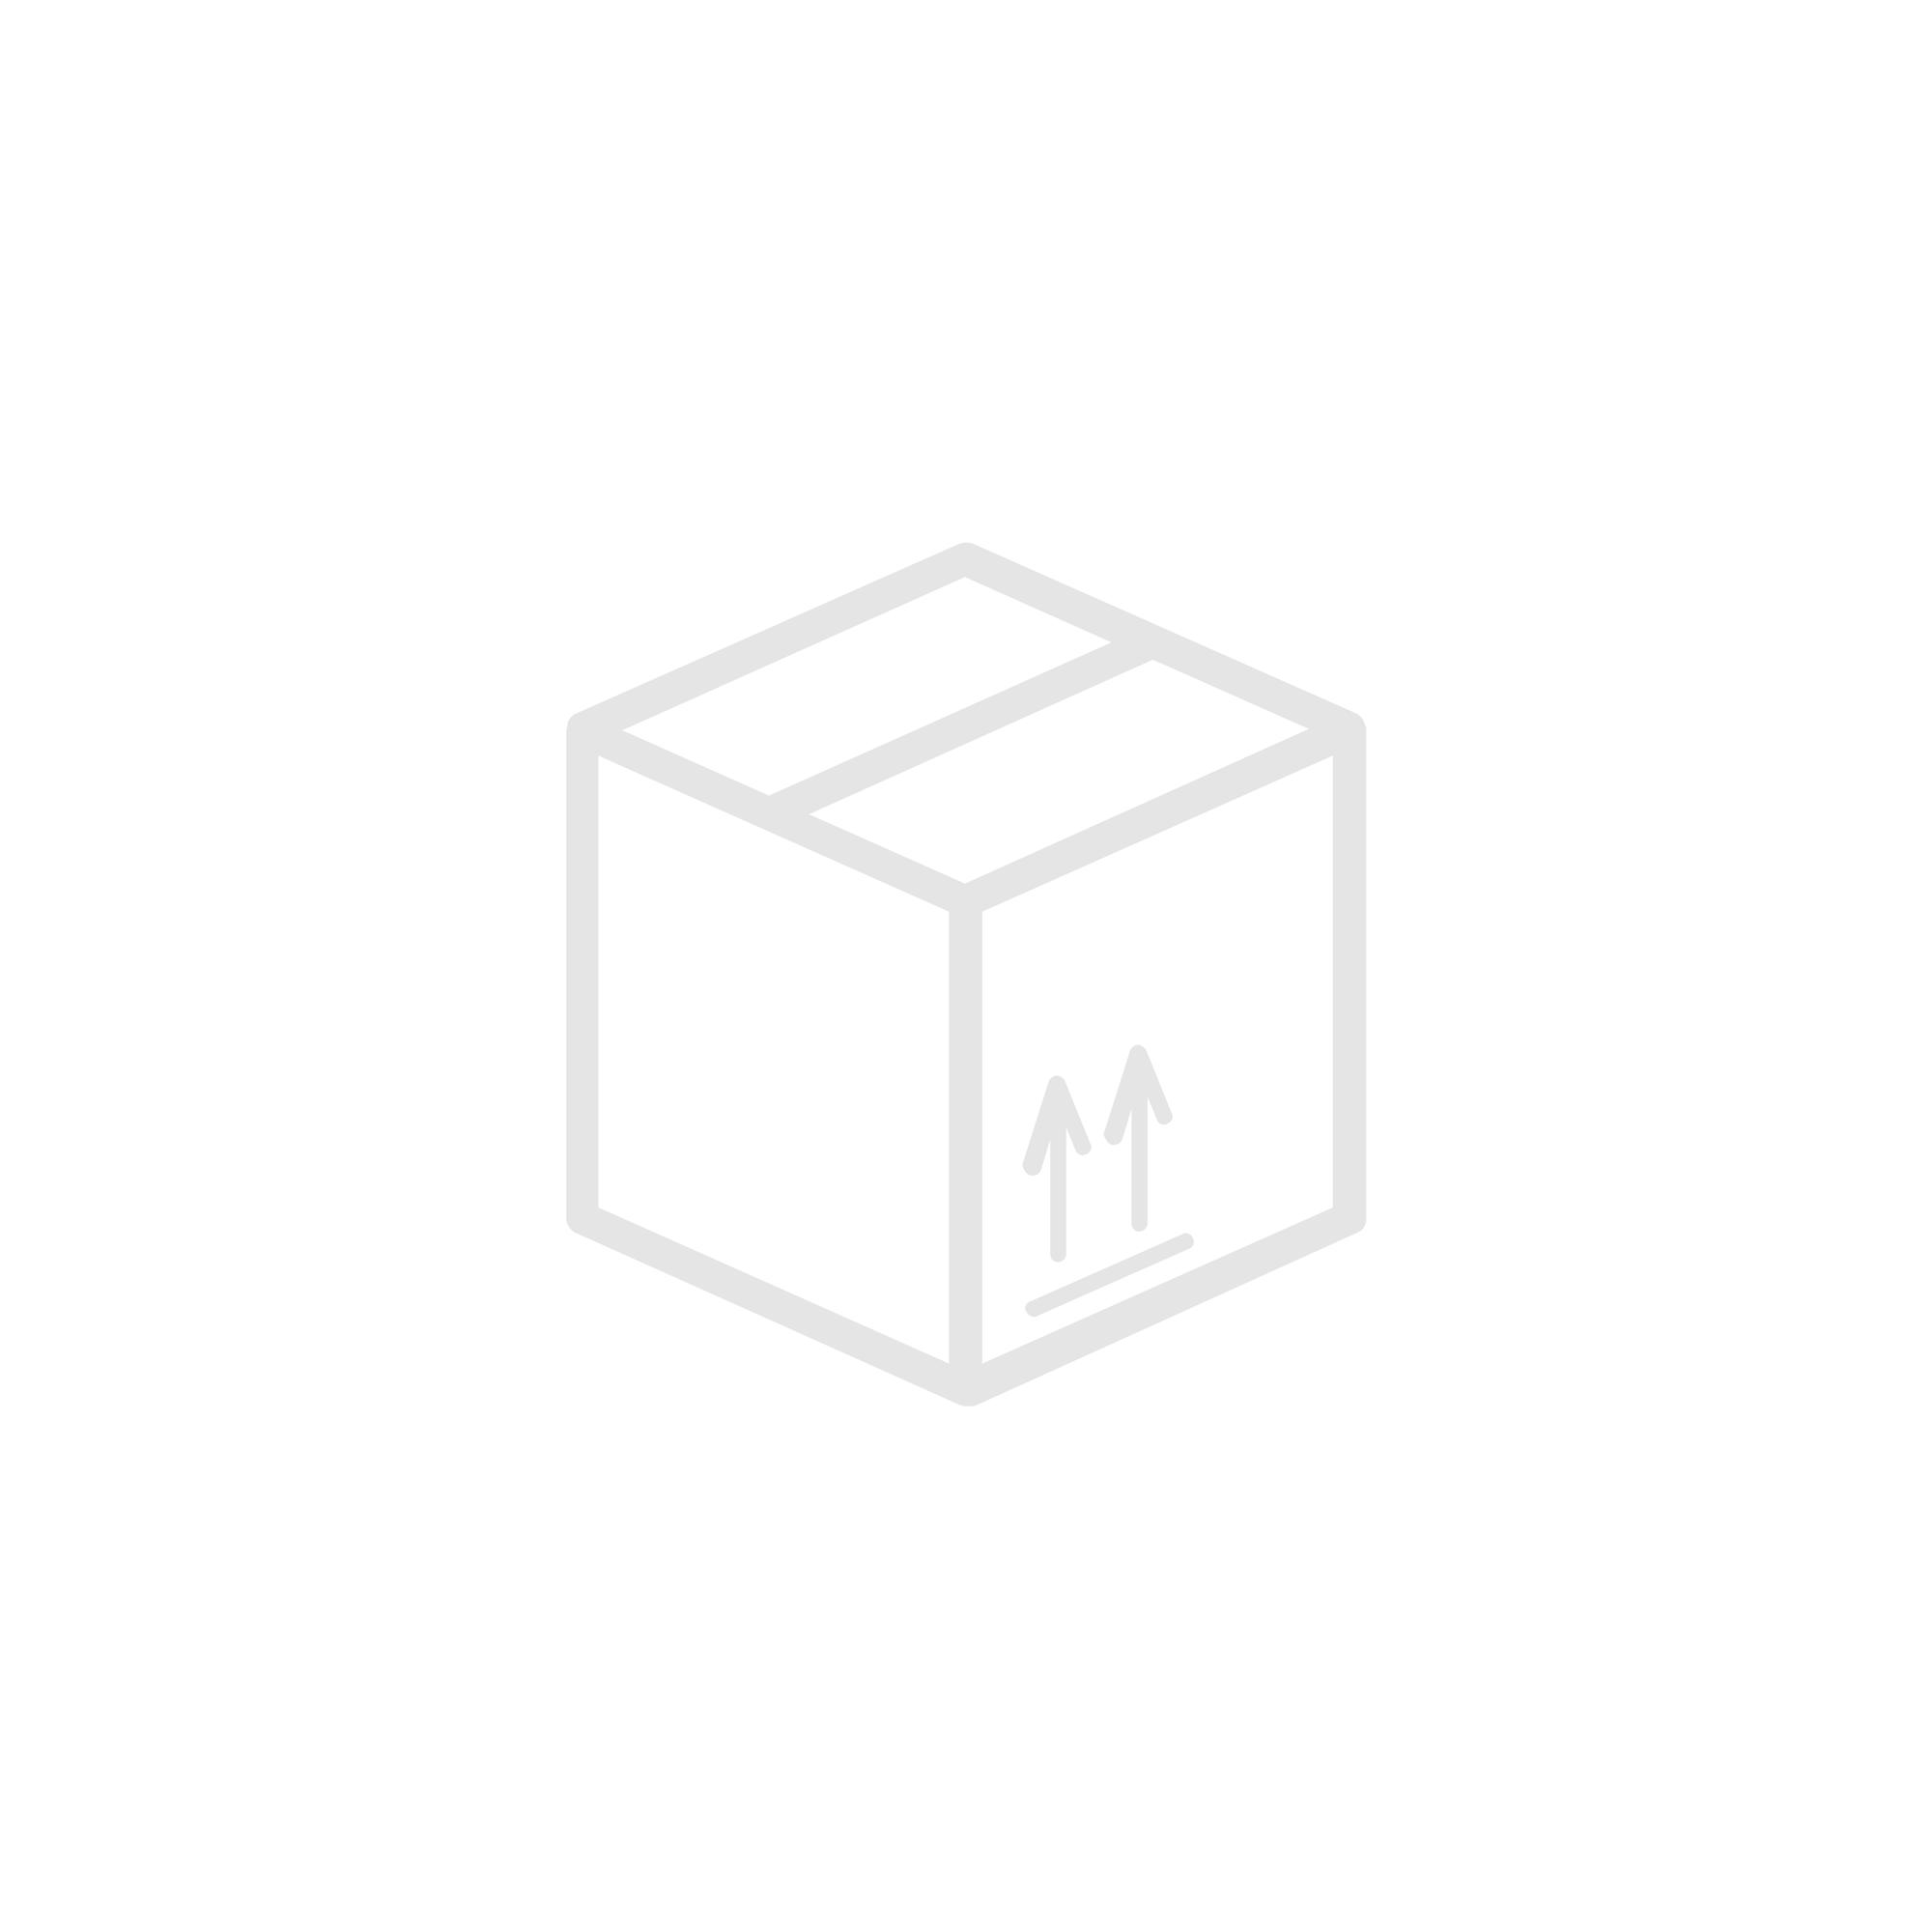 DISANO Svítidlo LED MICRORODIO 1980 29W 2483lm 4000K grafit IP66